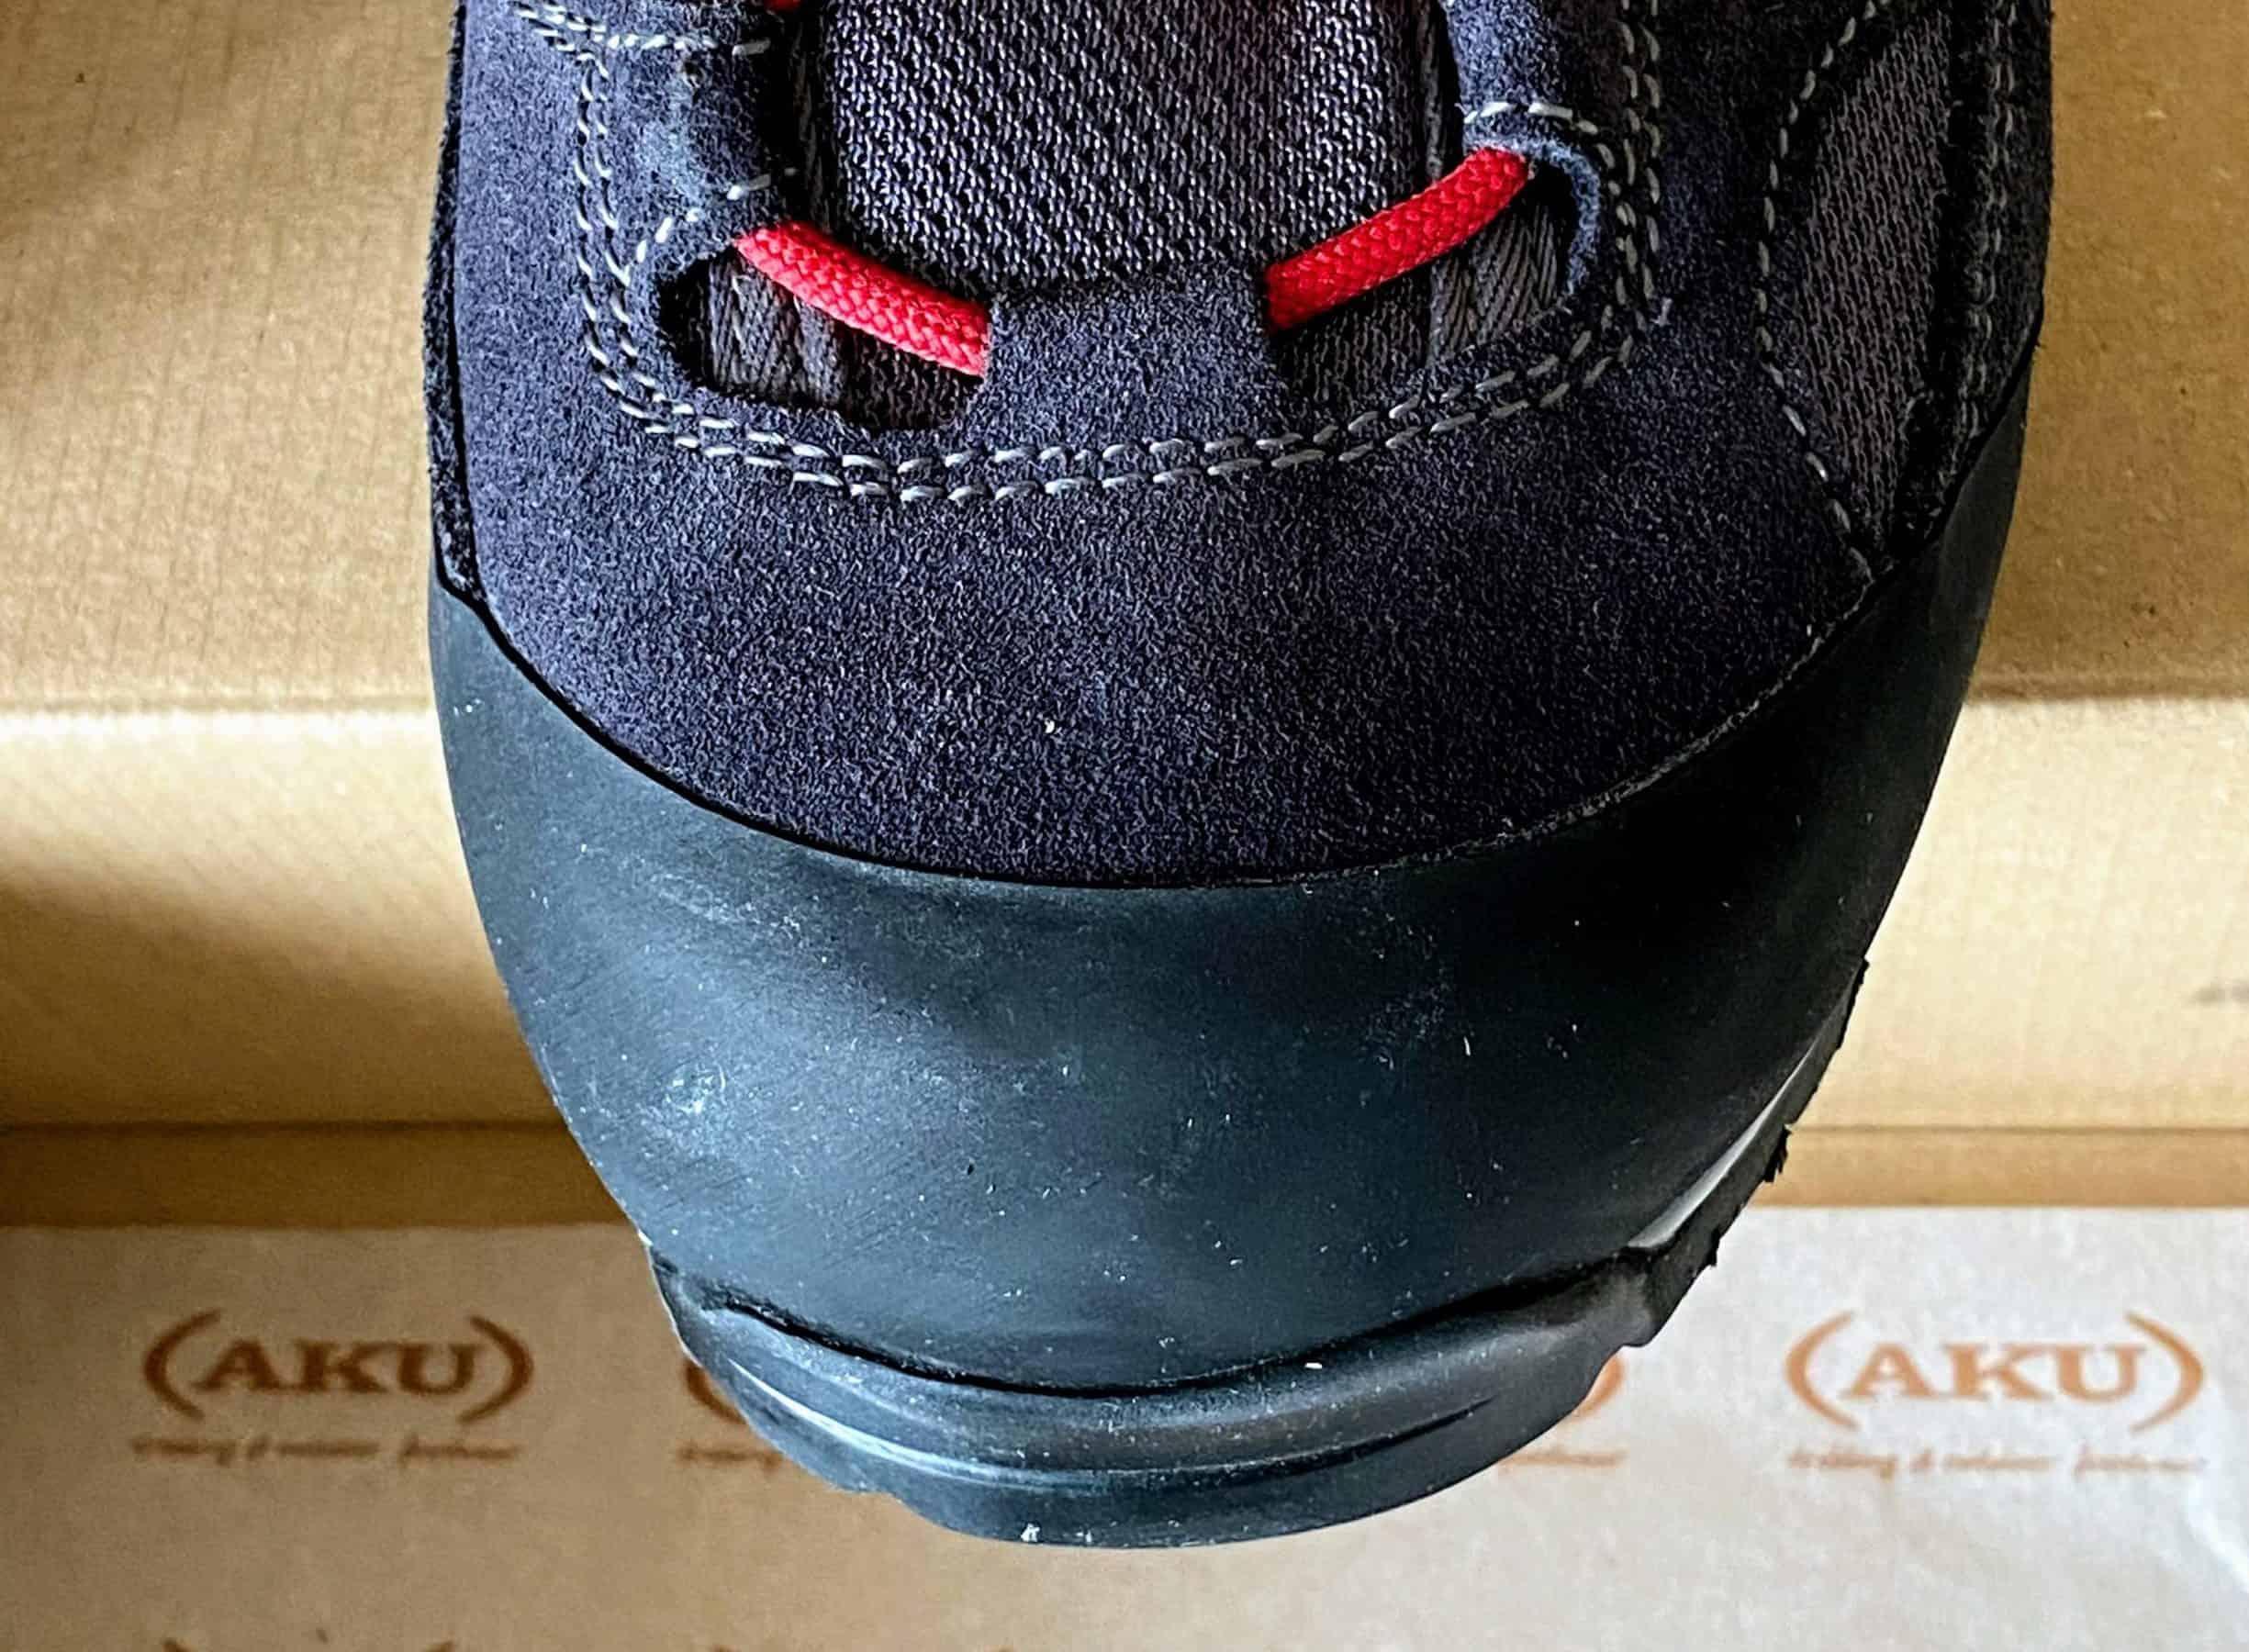 Aku Trekker Pro GTX, puntale protetto con fascia in gomma